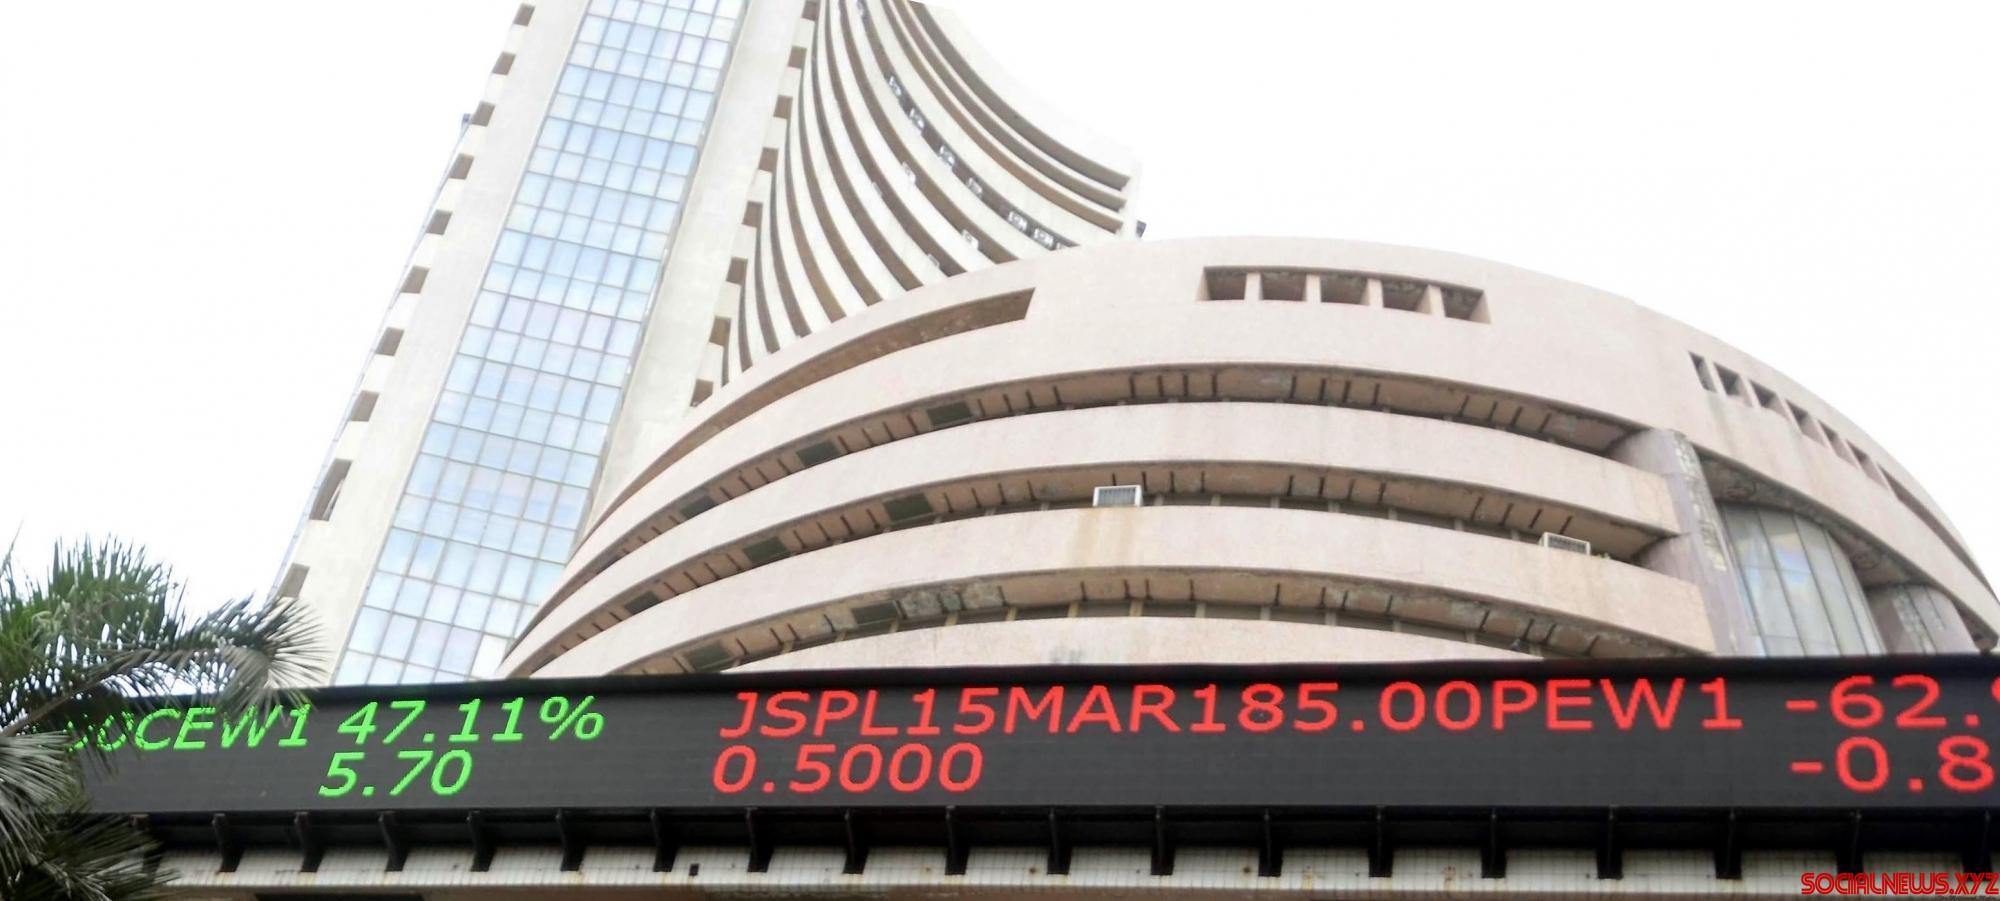 Kotak Mahindra Bank, Tata Motors' DVR to join Sensex from June